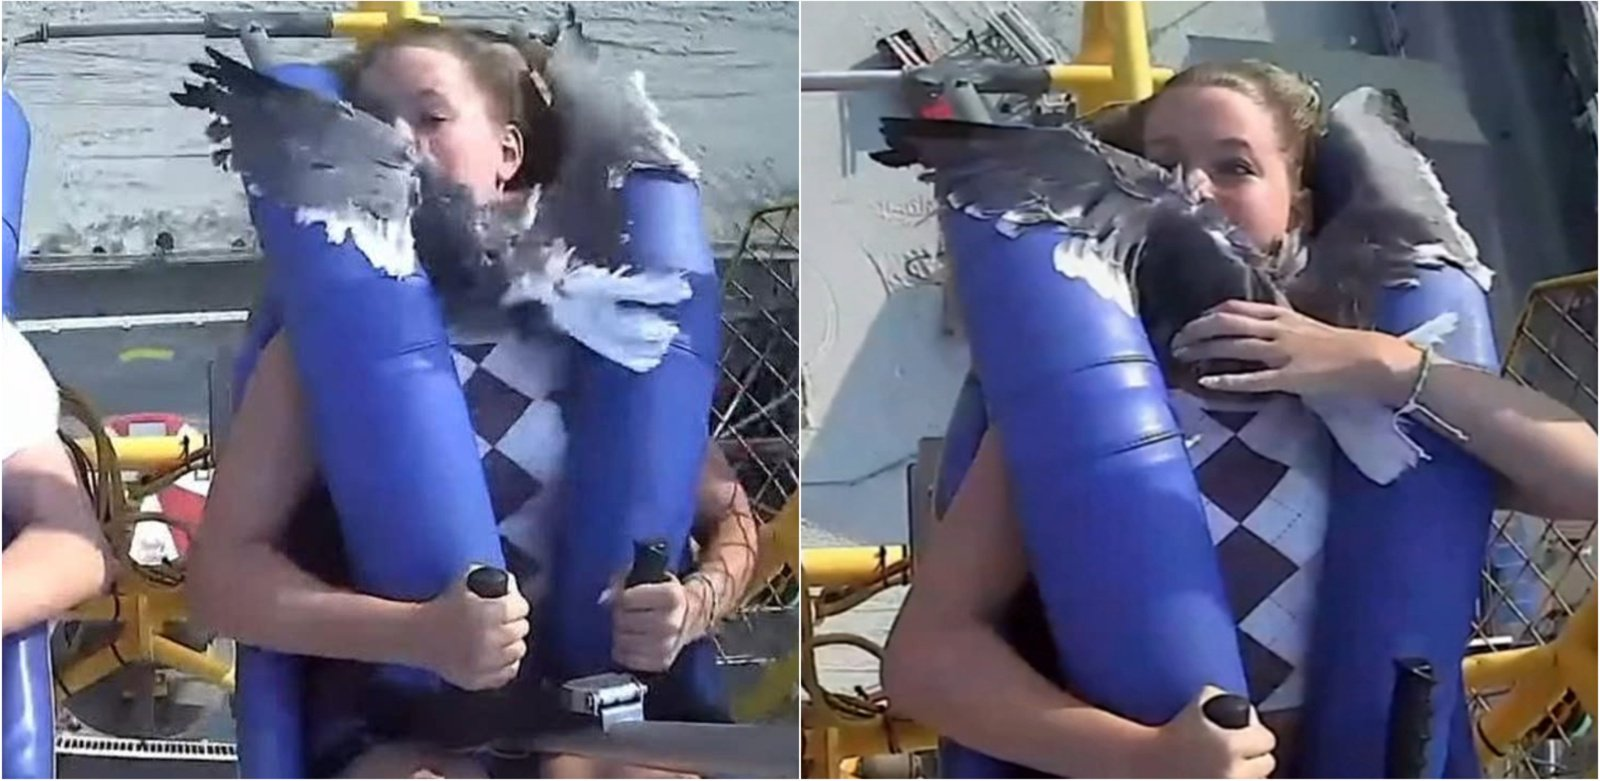 Nekasdienė patirtis: skriejant atrakcionu mergaitei į veidą rėžėsi žuvėdra